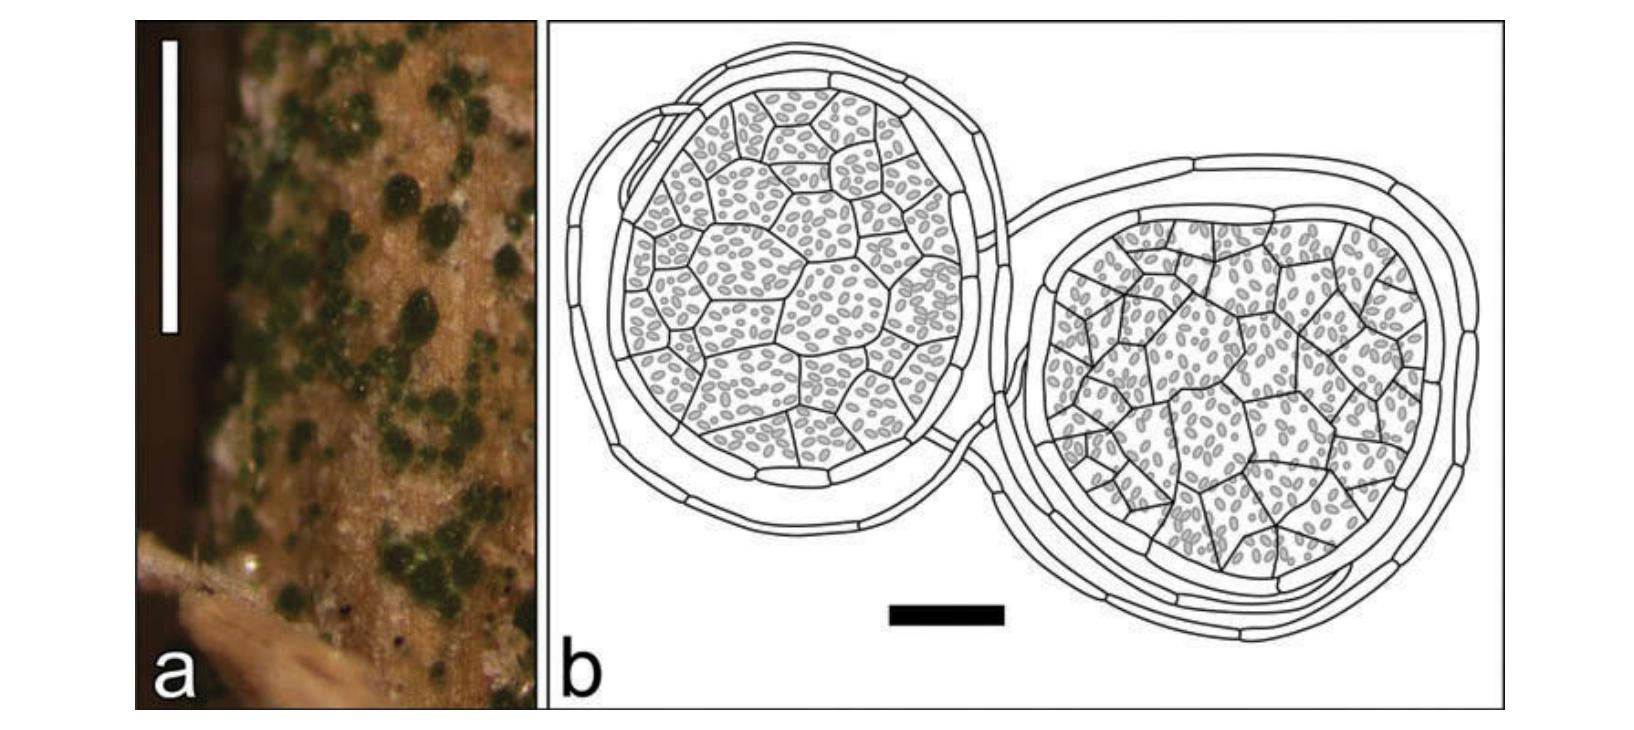 Lichenized thallus; fungal hyphae surrounding photosynthetic algae from the genus  Coccomyxa .  Sandoval-Leiva et al. 2017 .